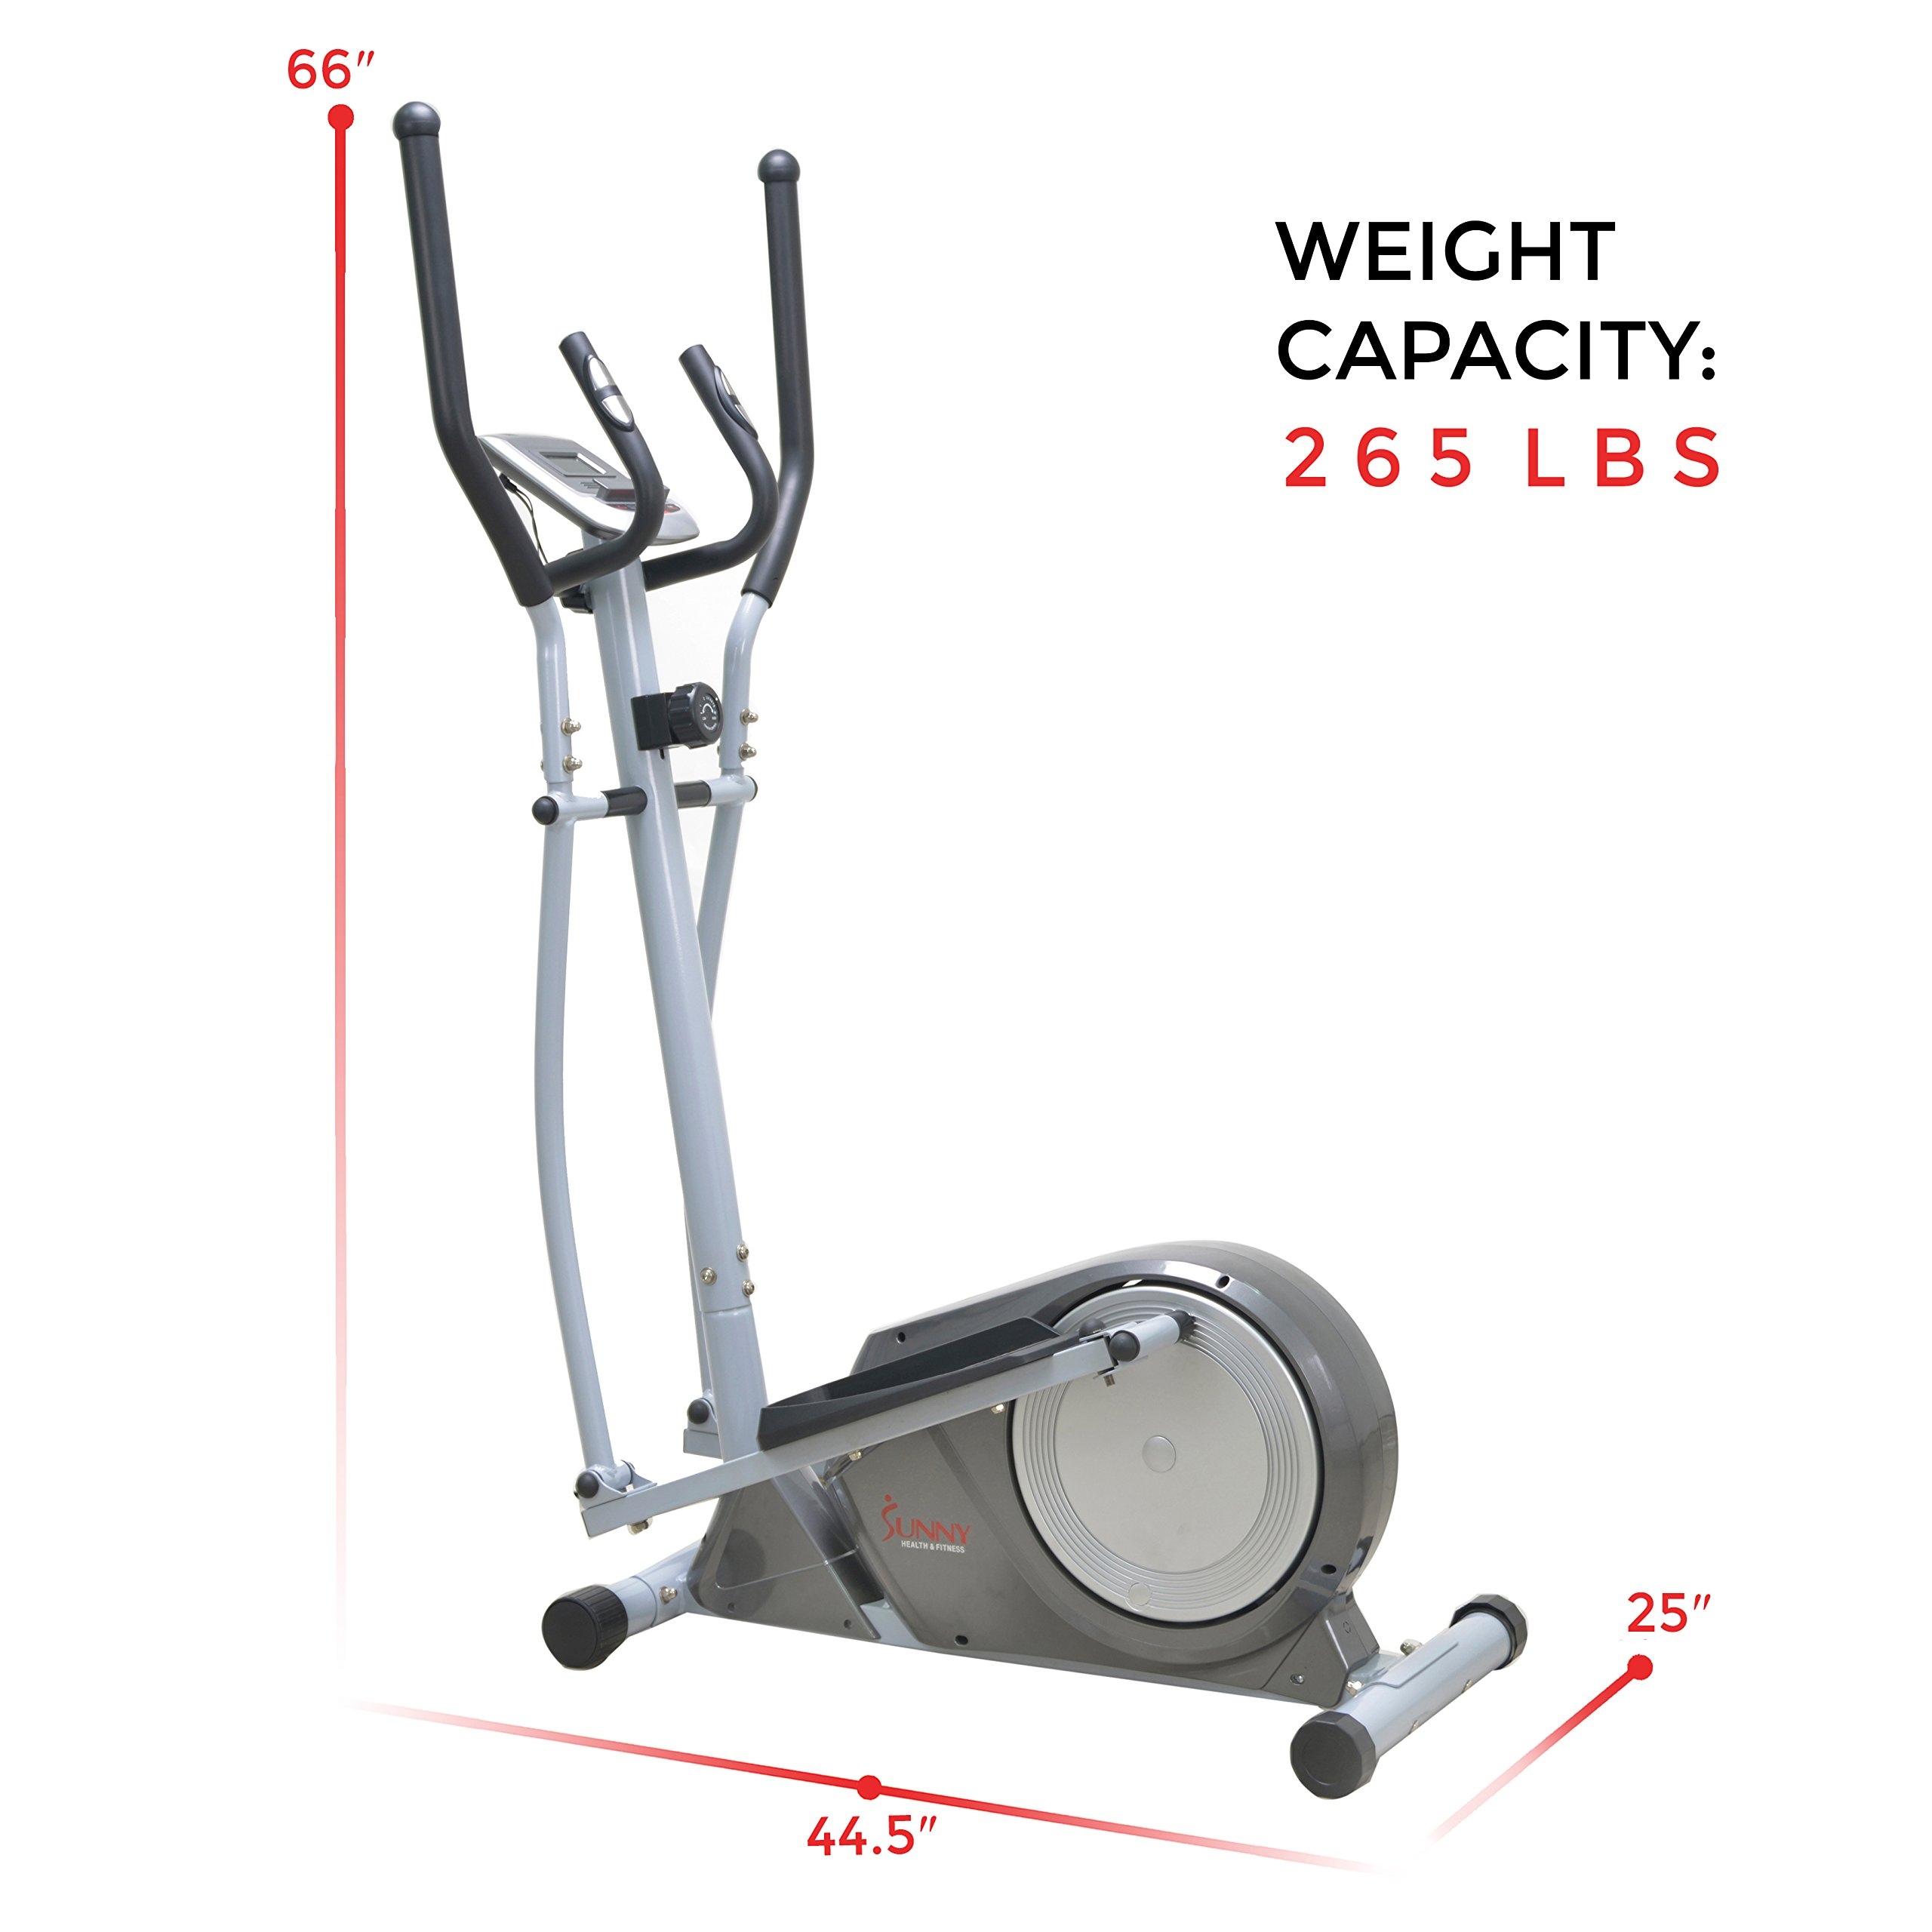 Sunny Health & Fitness SF-E3609 Magnetic Elliptical Trainer Elliptical Machine by Sunny Health & Fitness